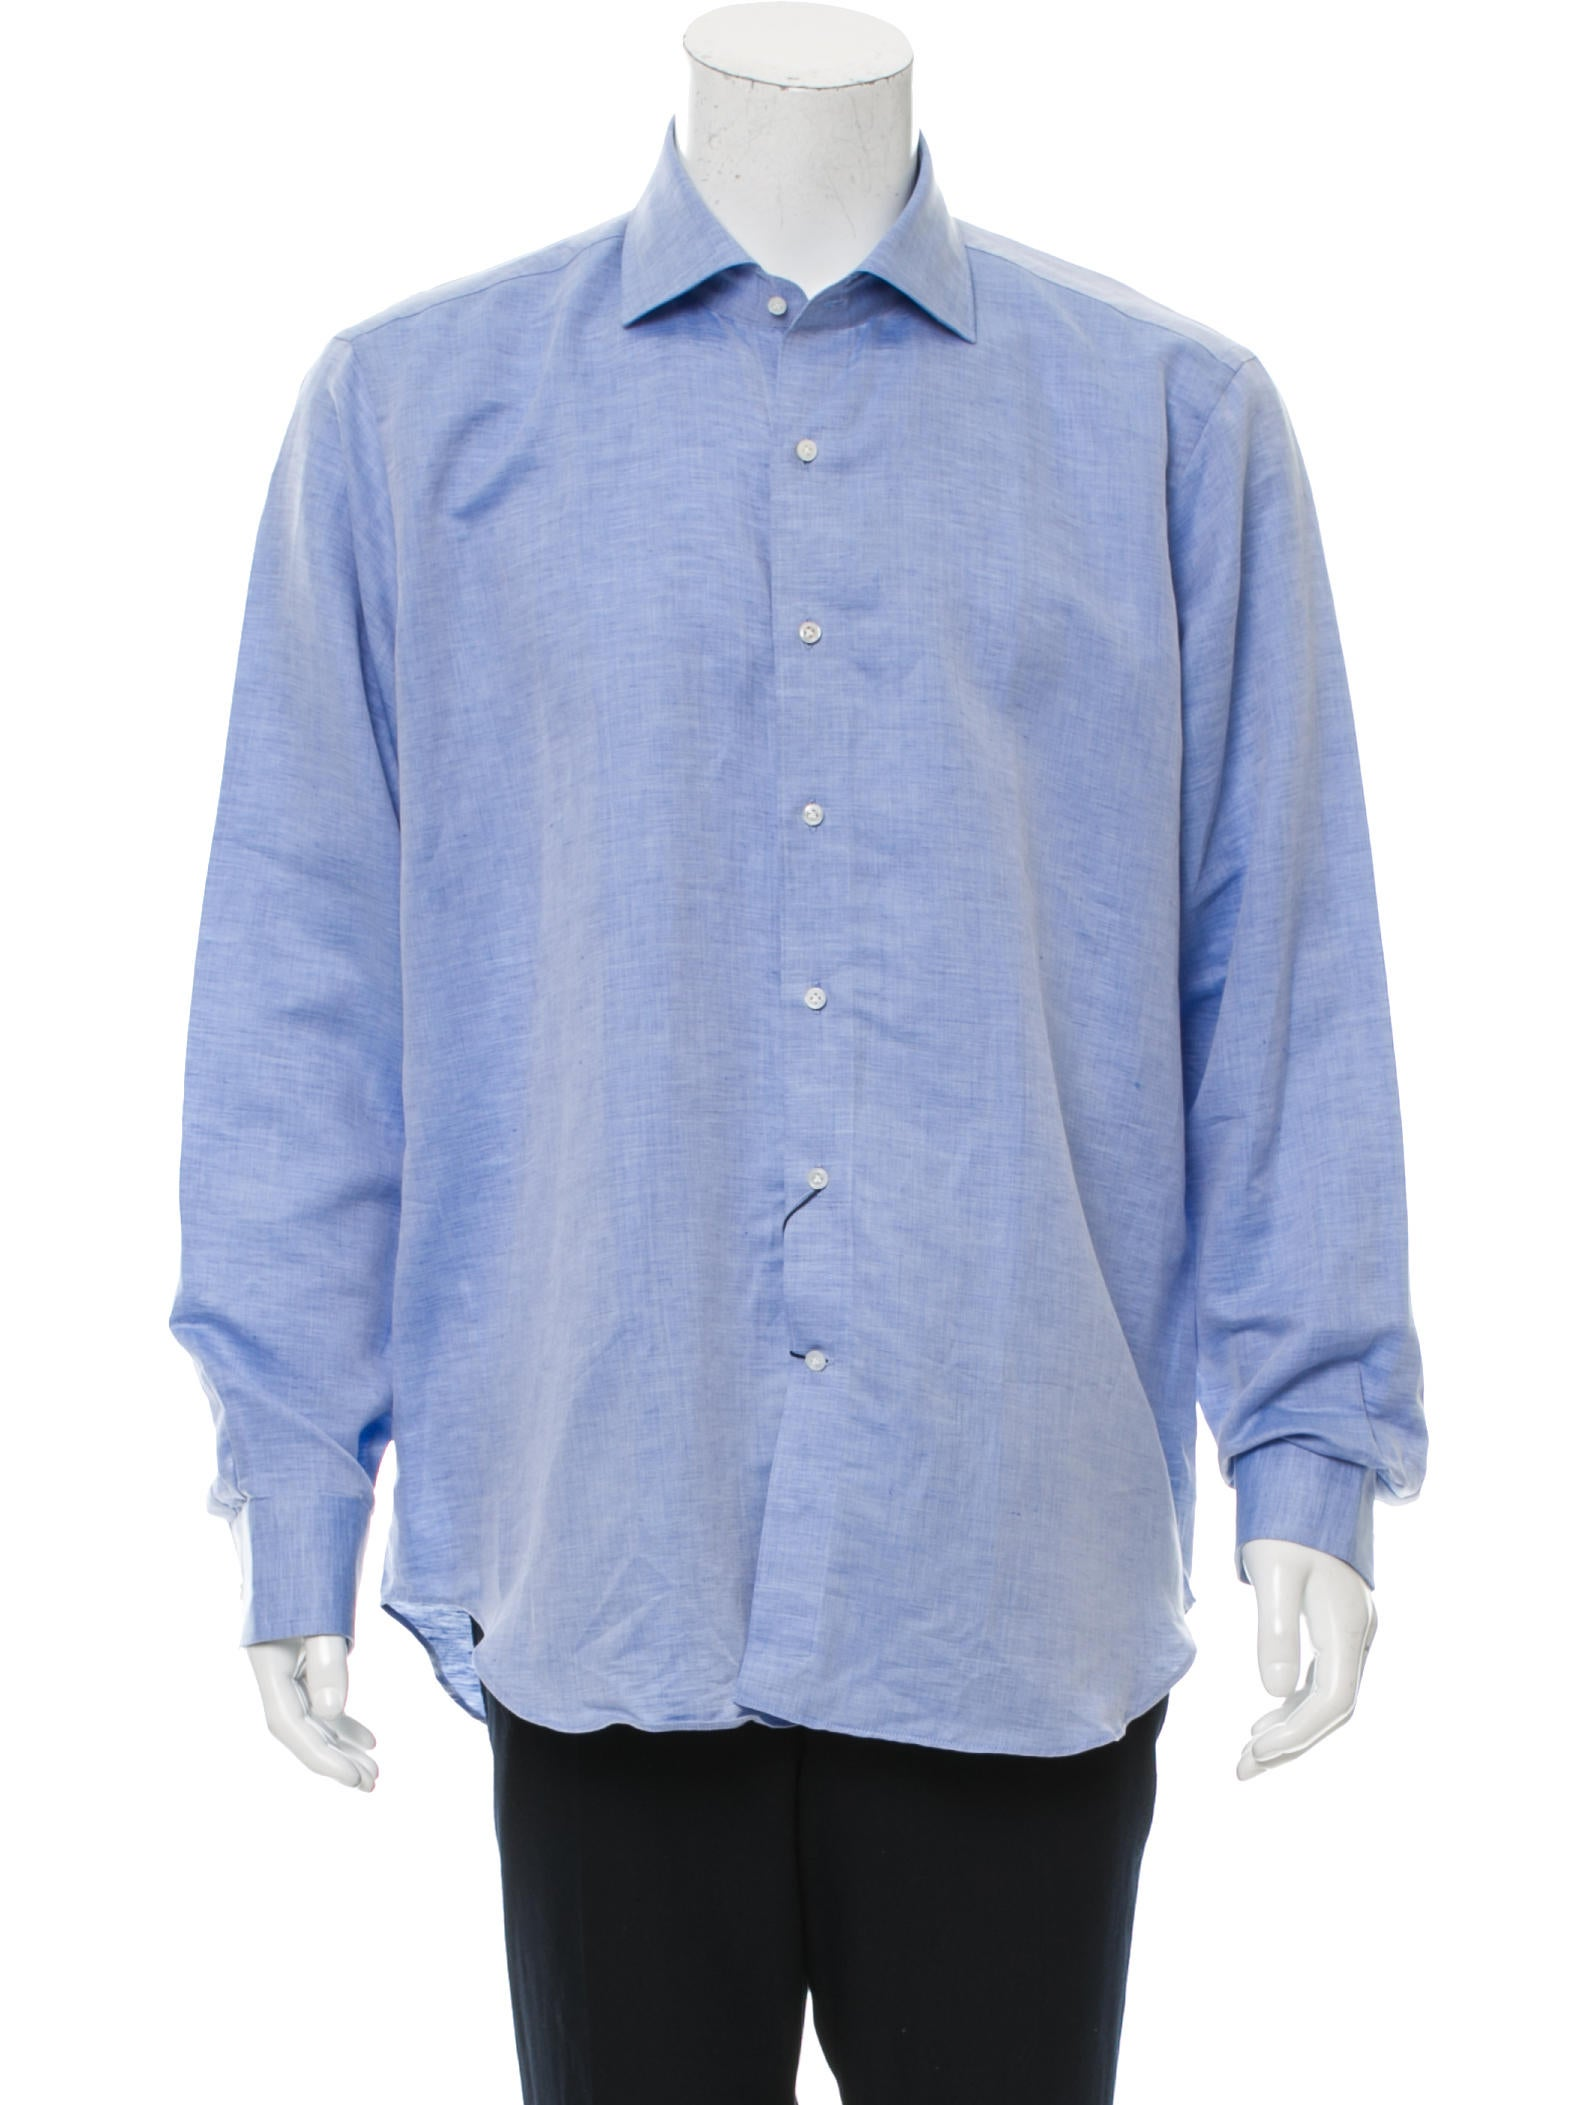 peter millar linen button up shirt w tags clothing